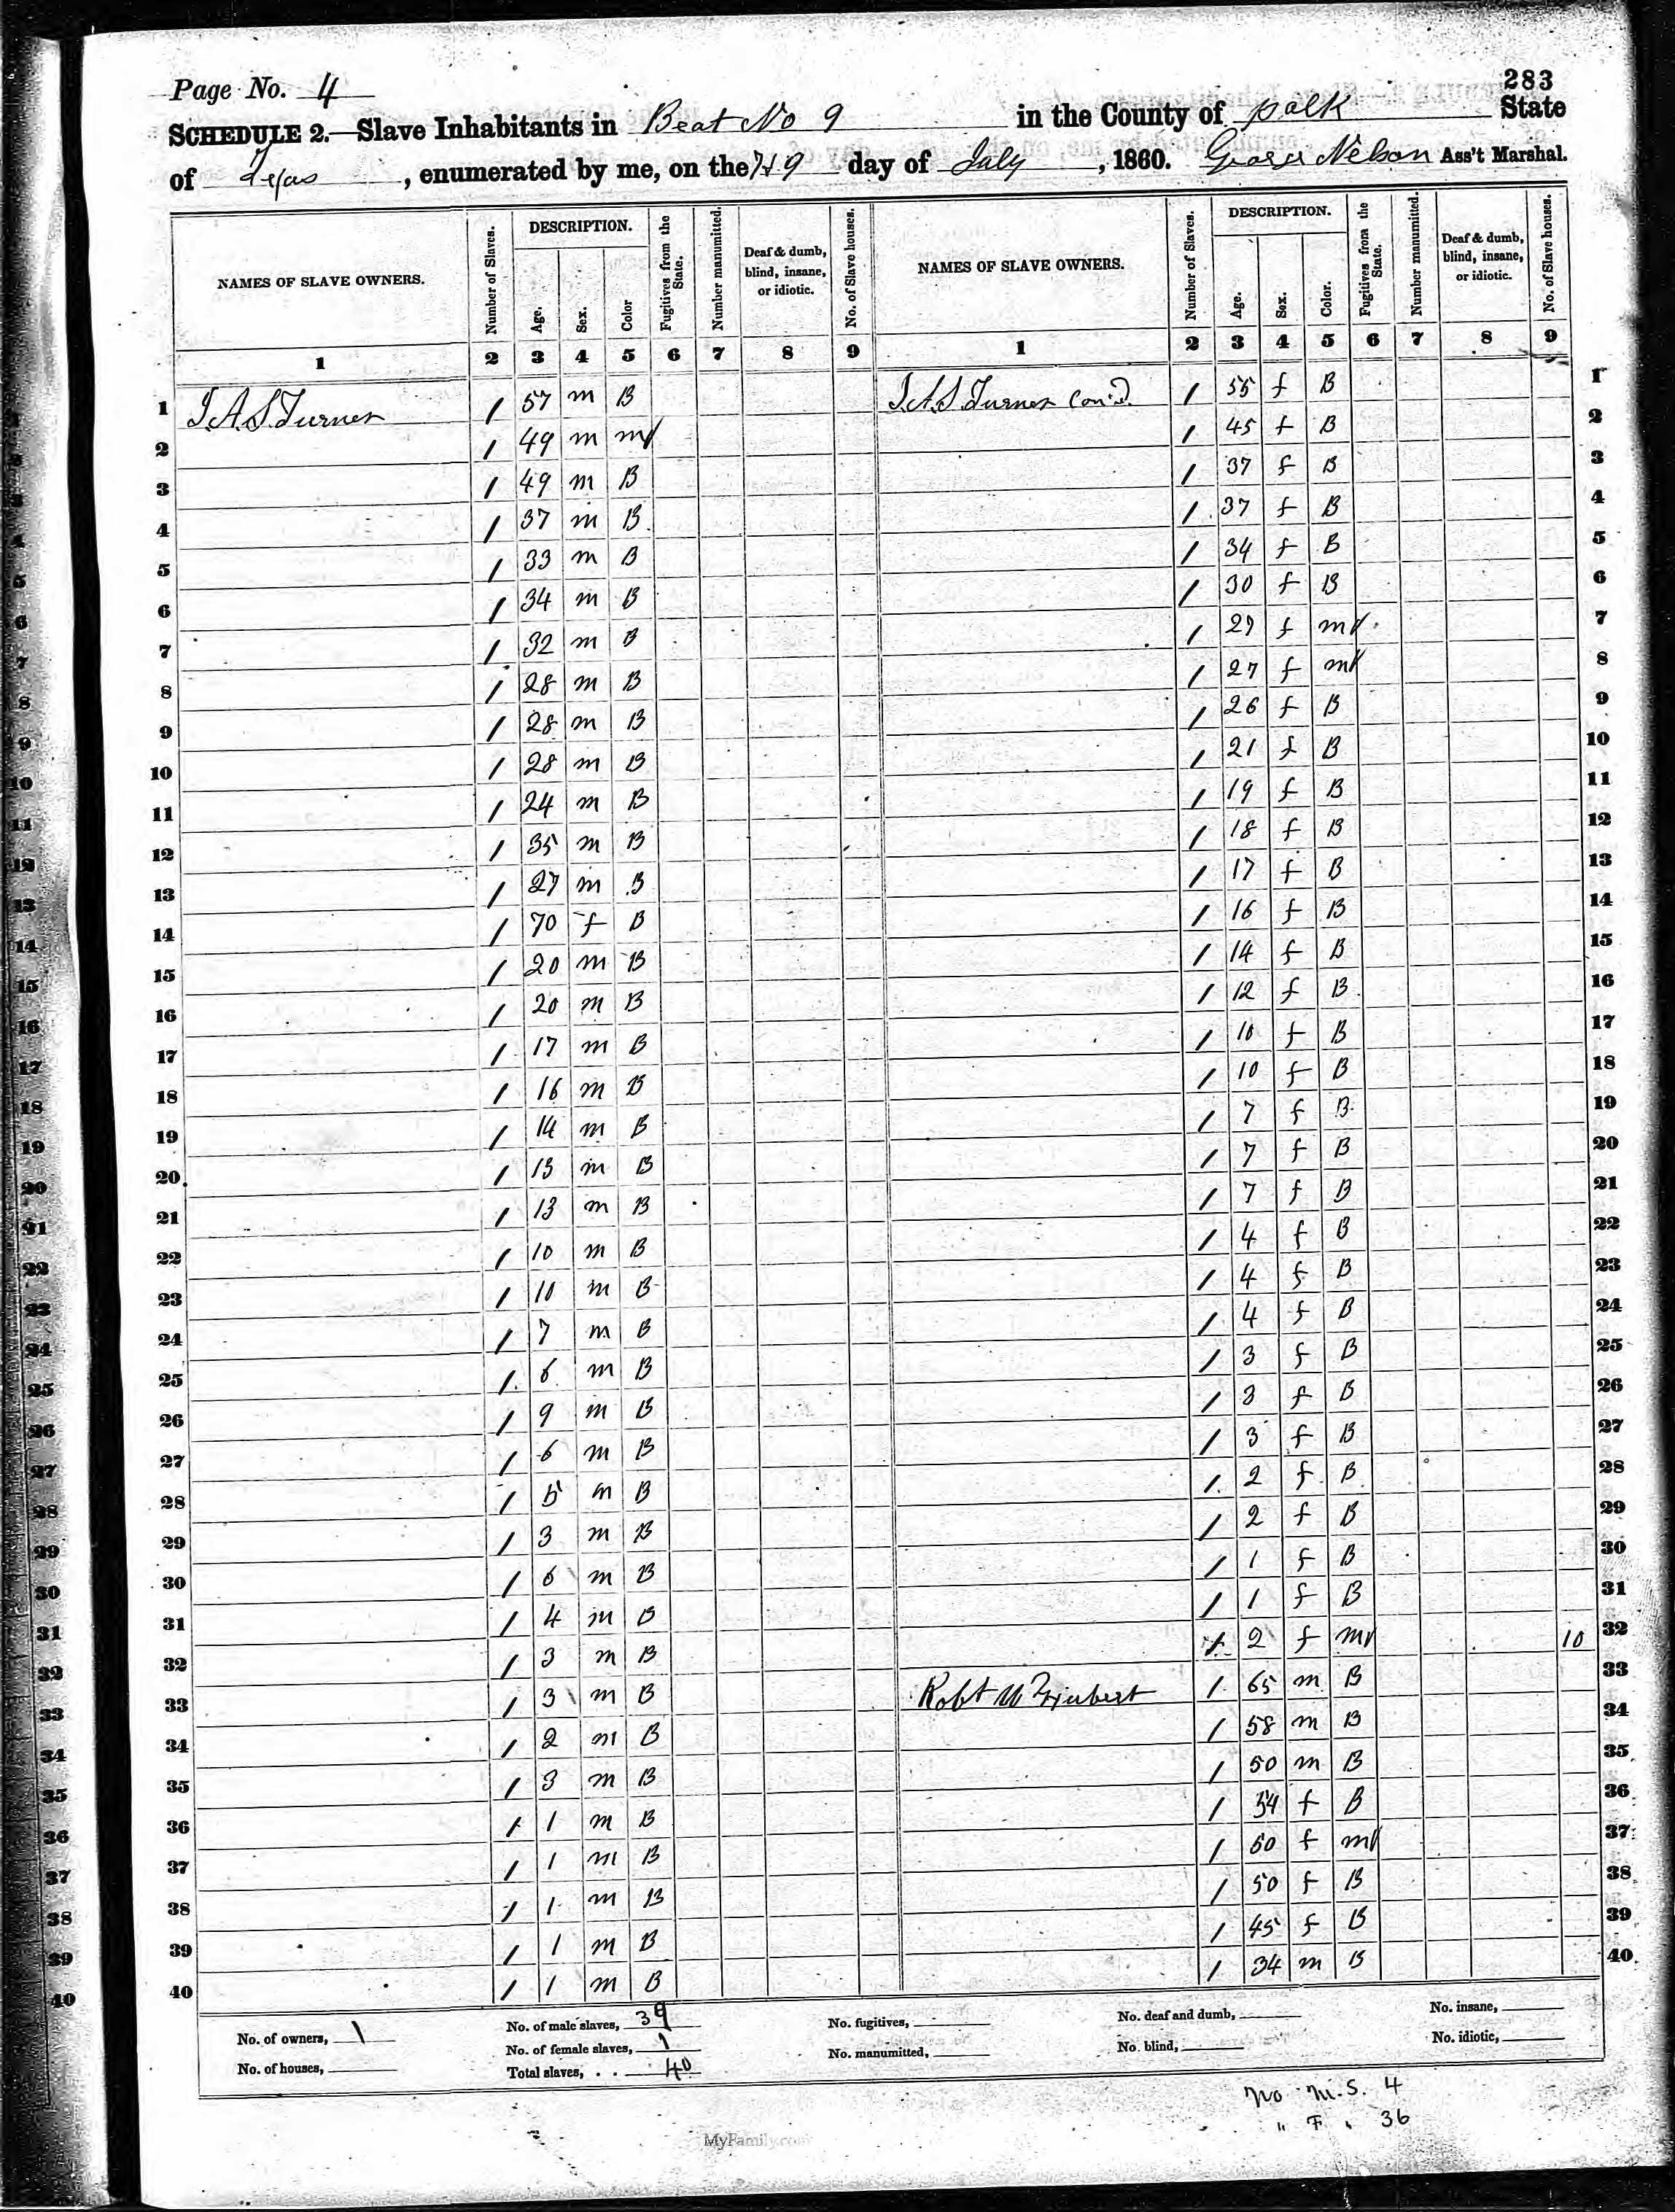 RWH slave schedule 1860 page 1.jpg